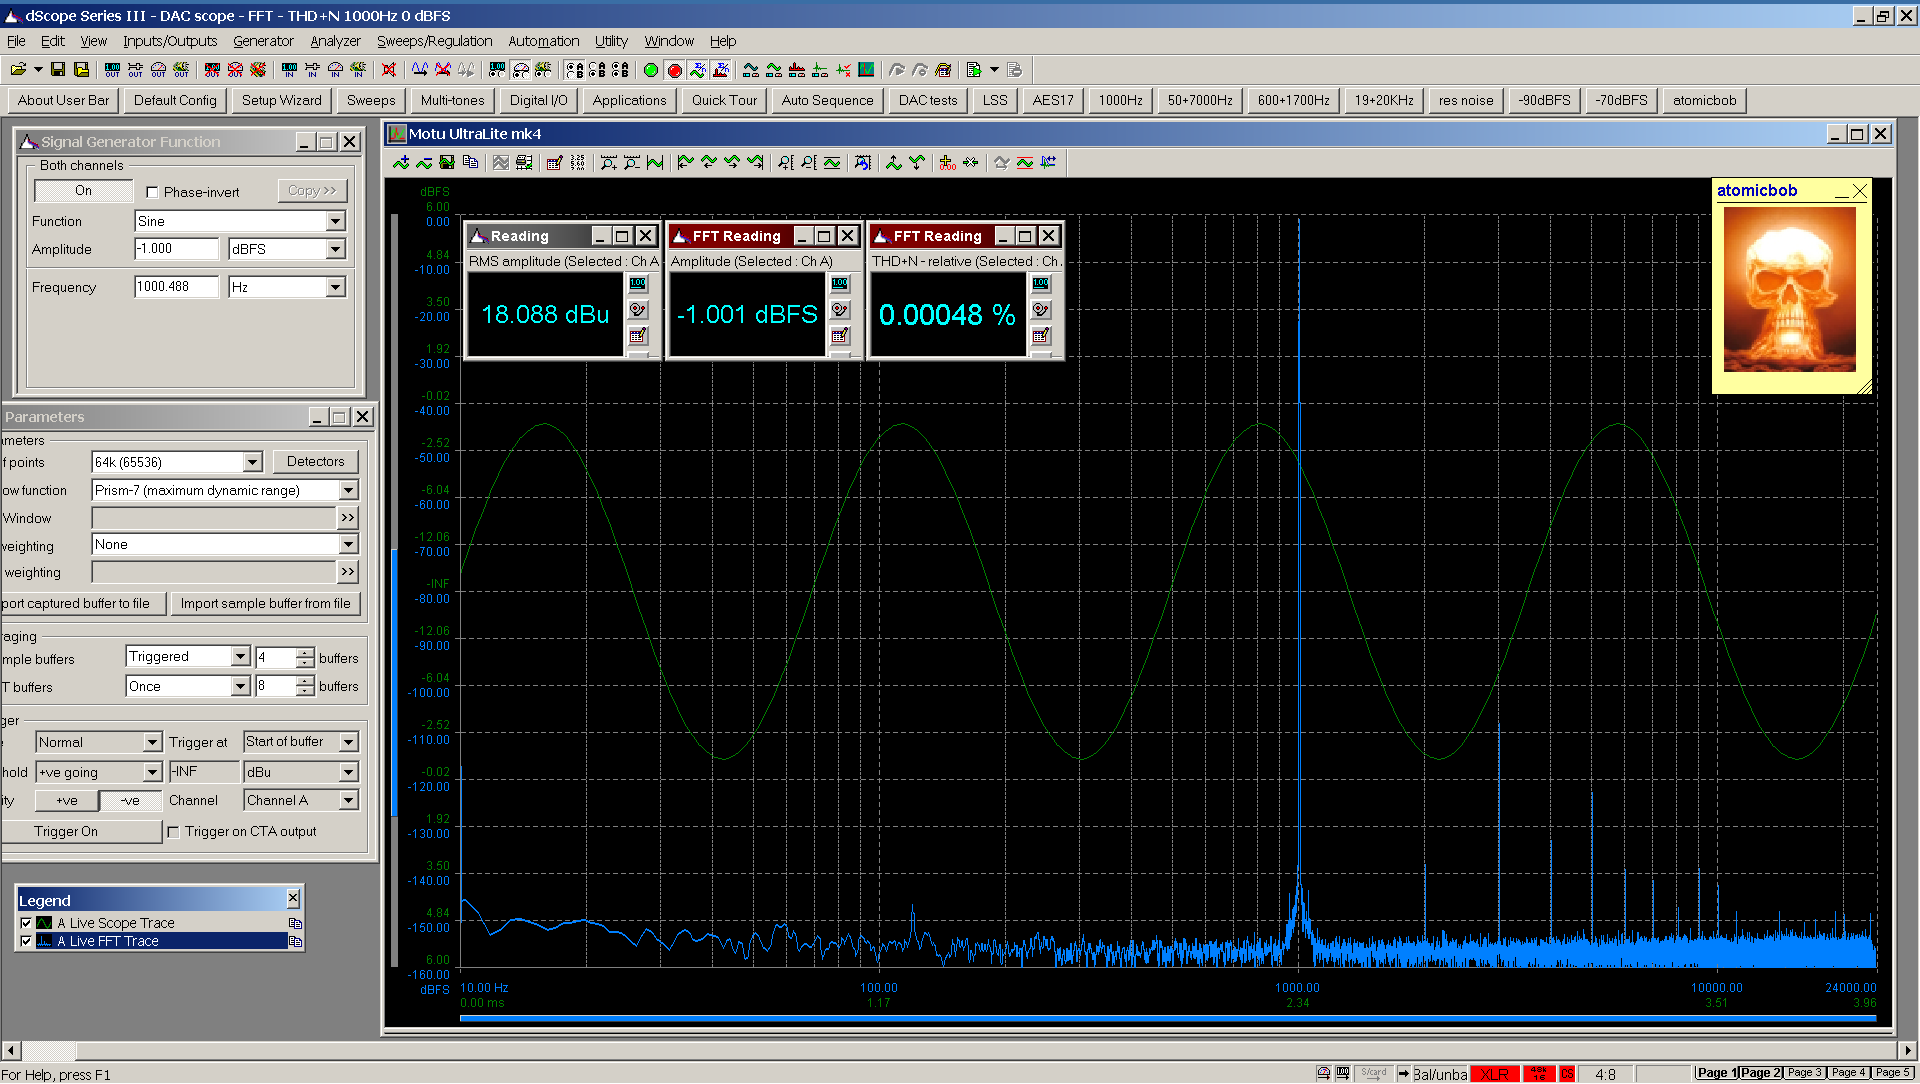 20200531-04 UltraLite-mk4 THD+N FFT -1_0 dBFS - spdif Bal.png